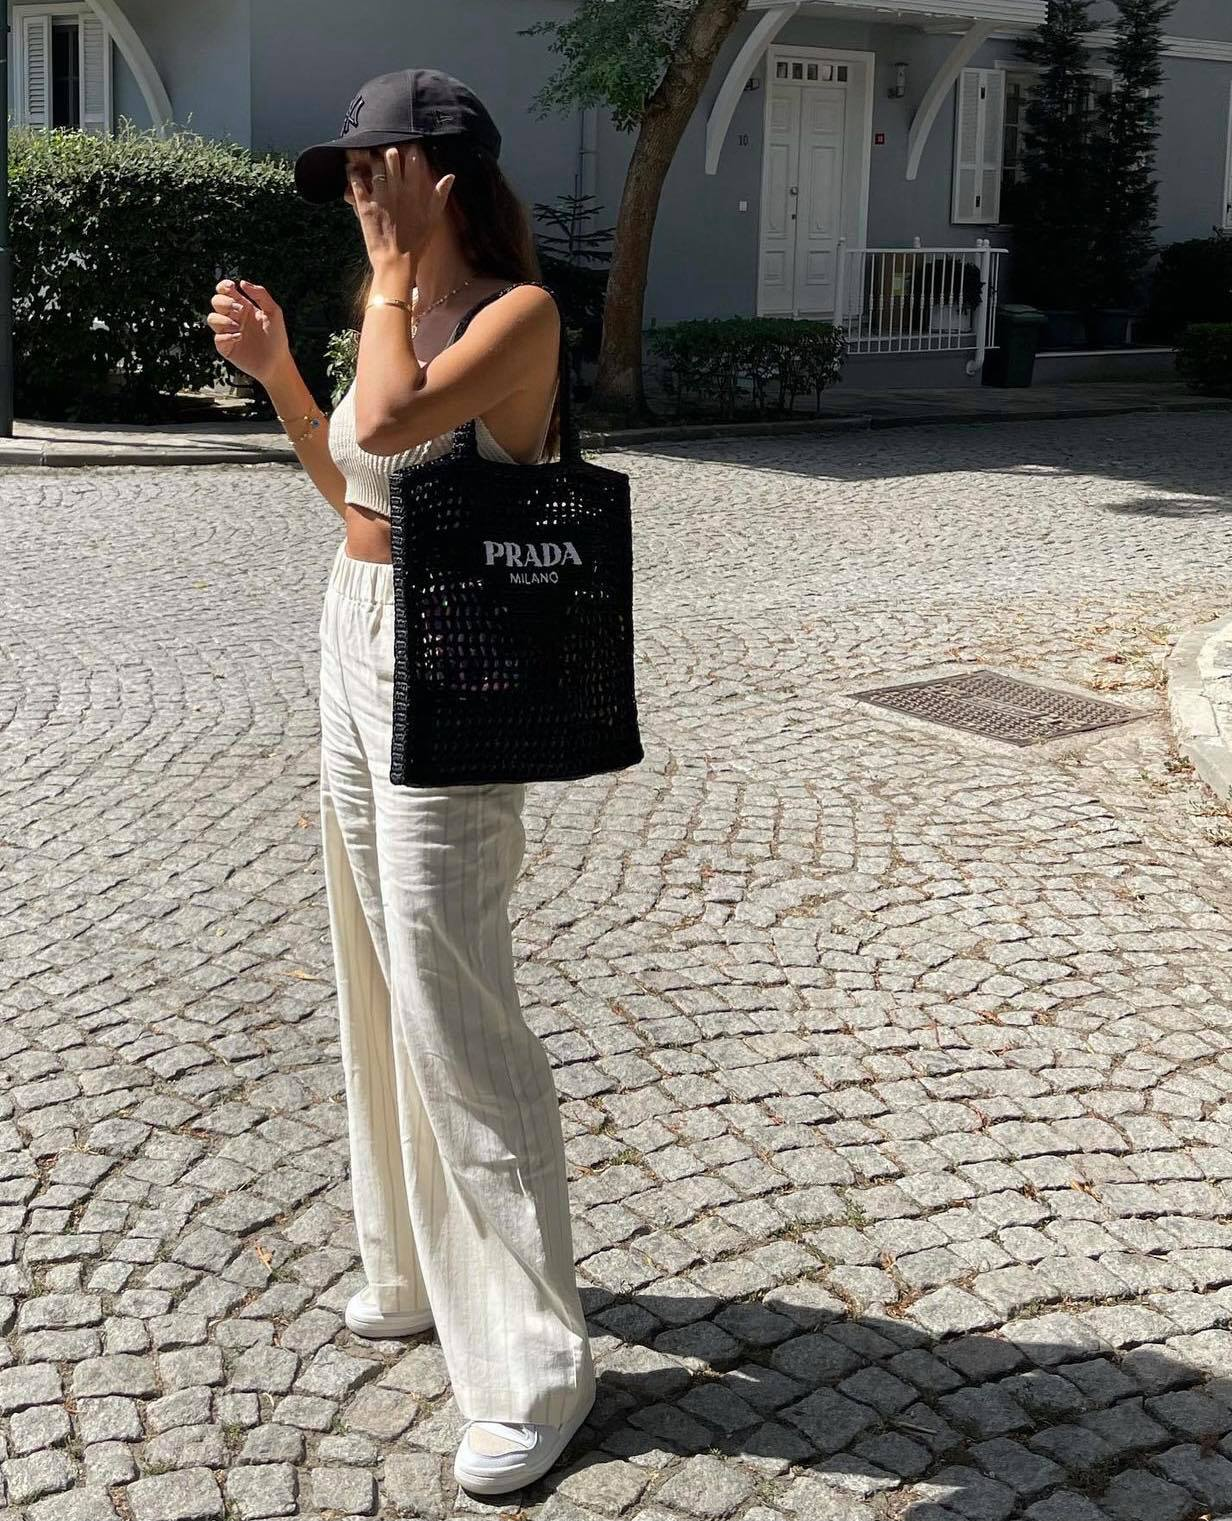 túi black raffia tote bag của Prada